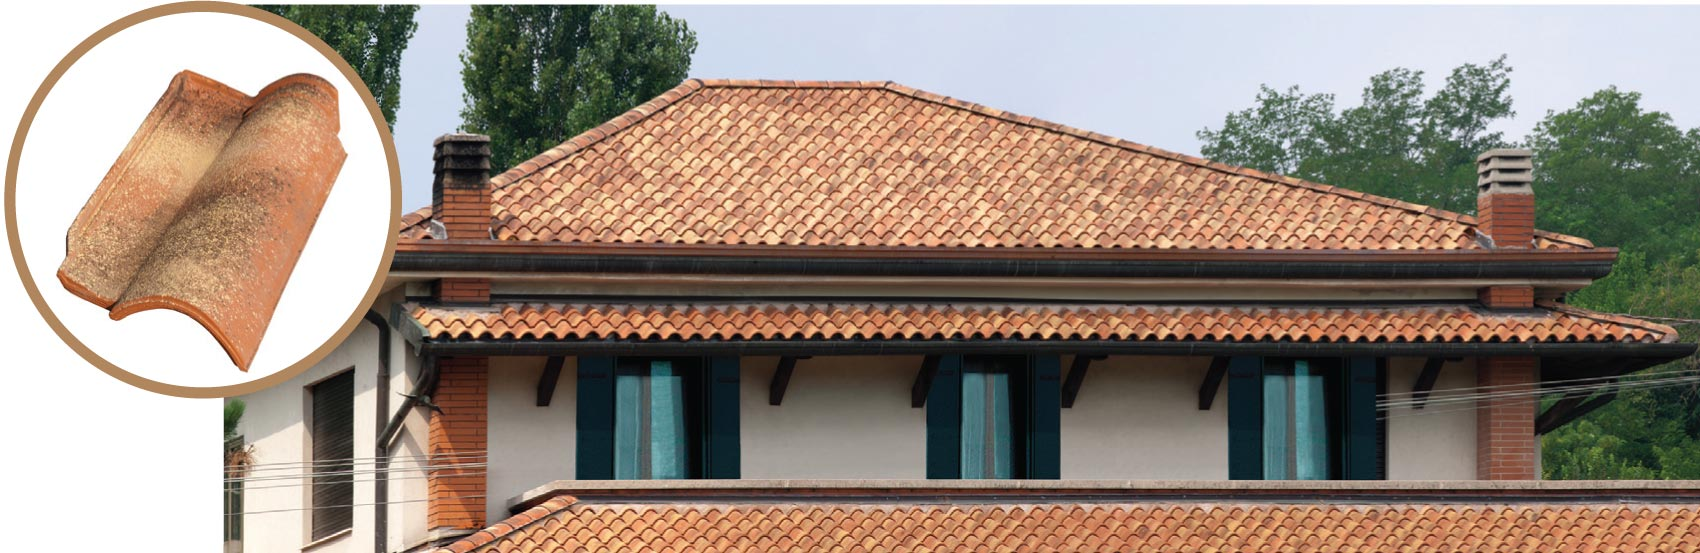 Dachówka firmy Tognana, Tuscany, kolor Dolomite.